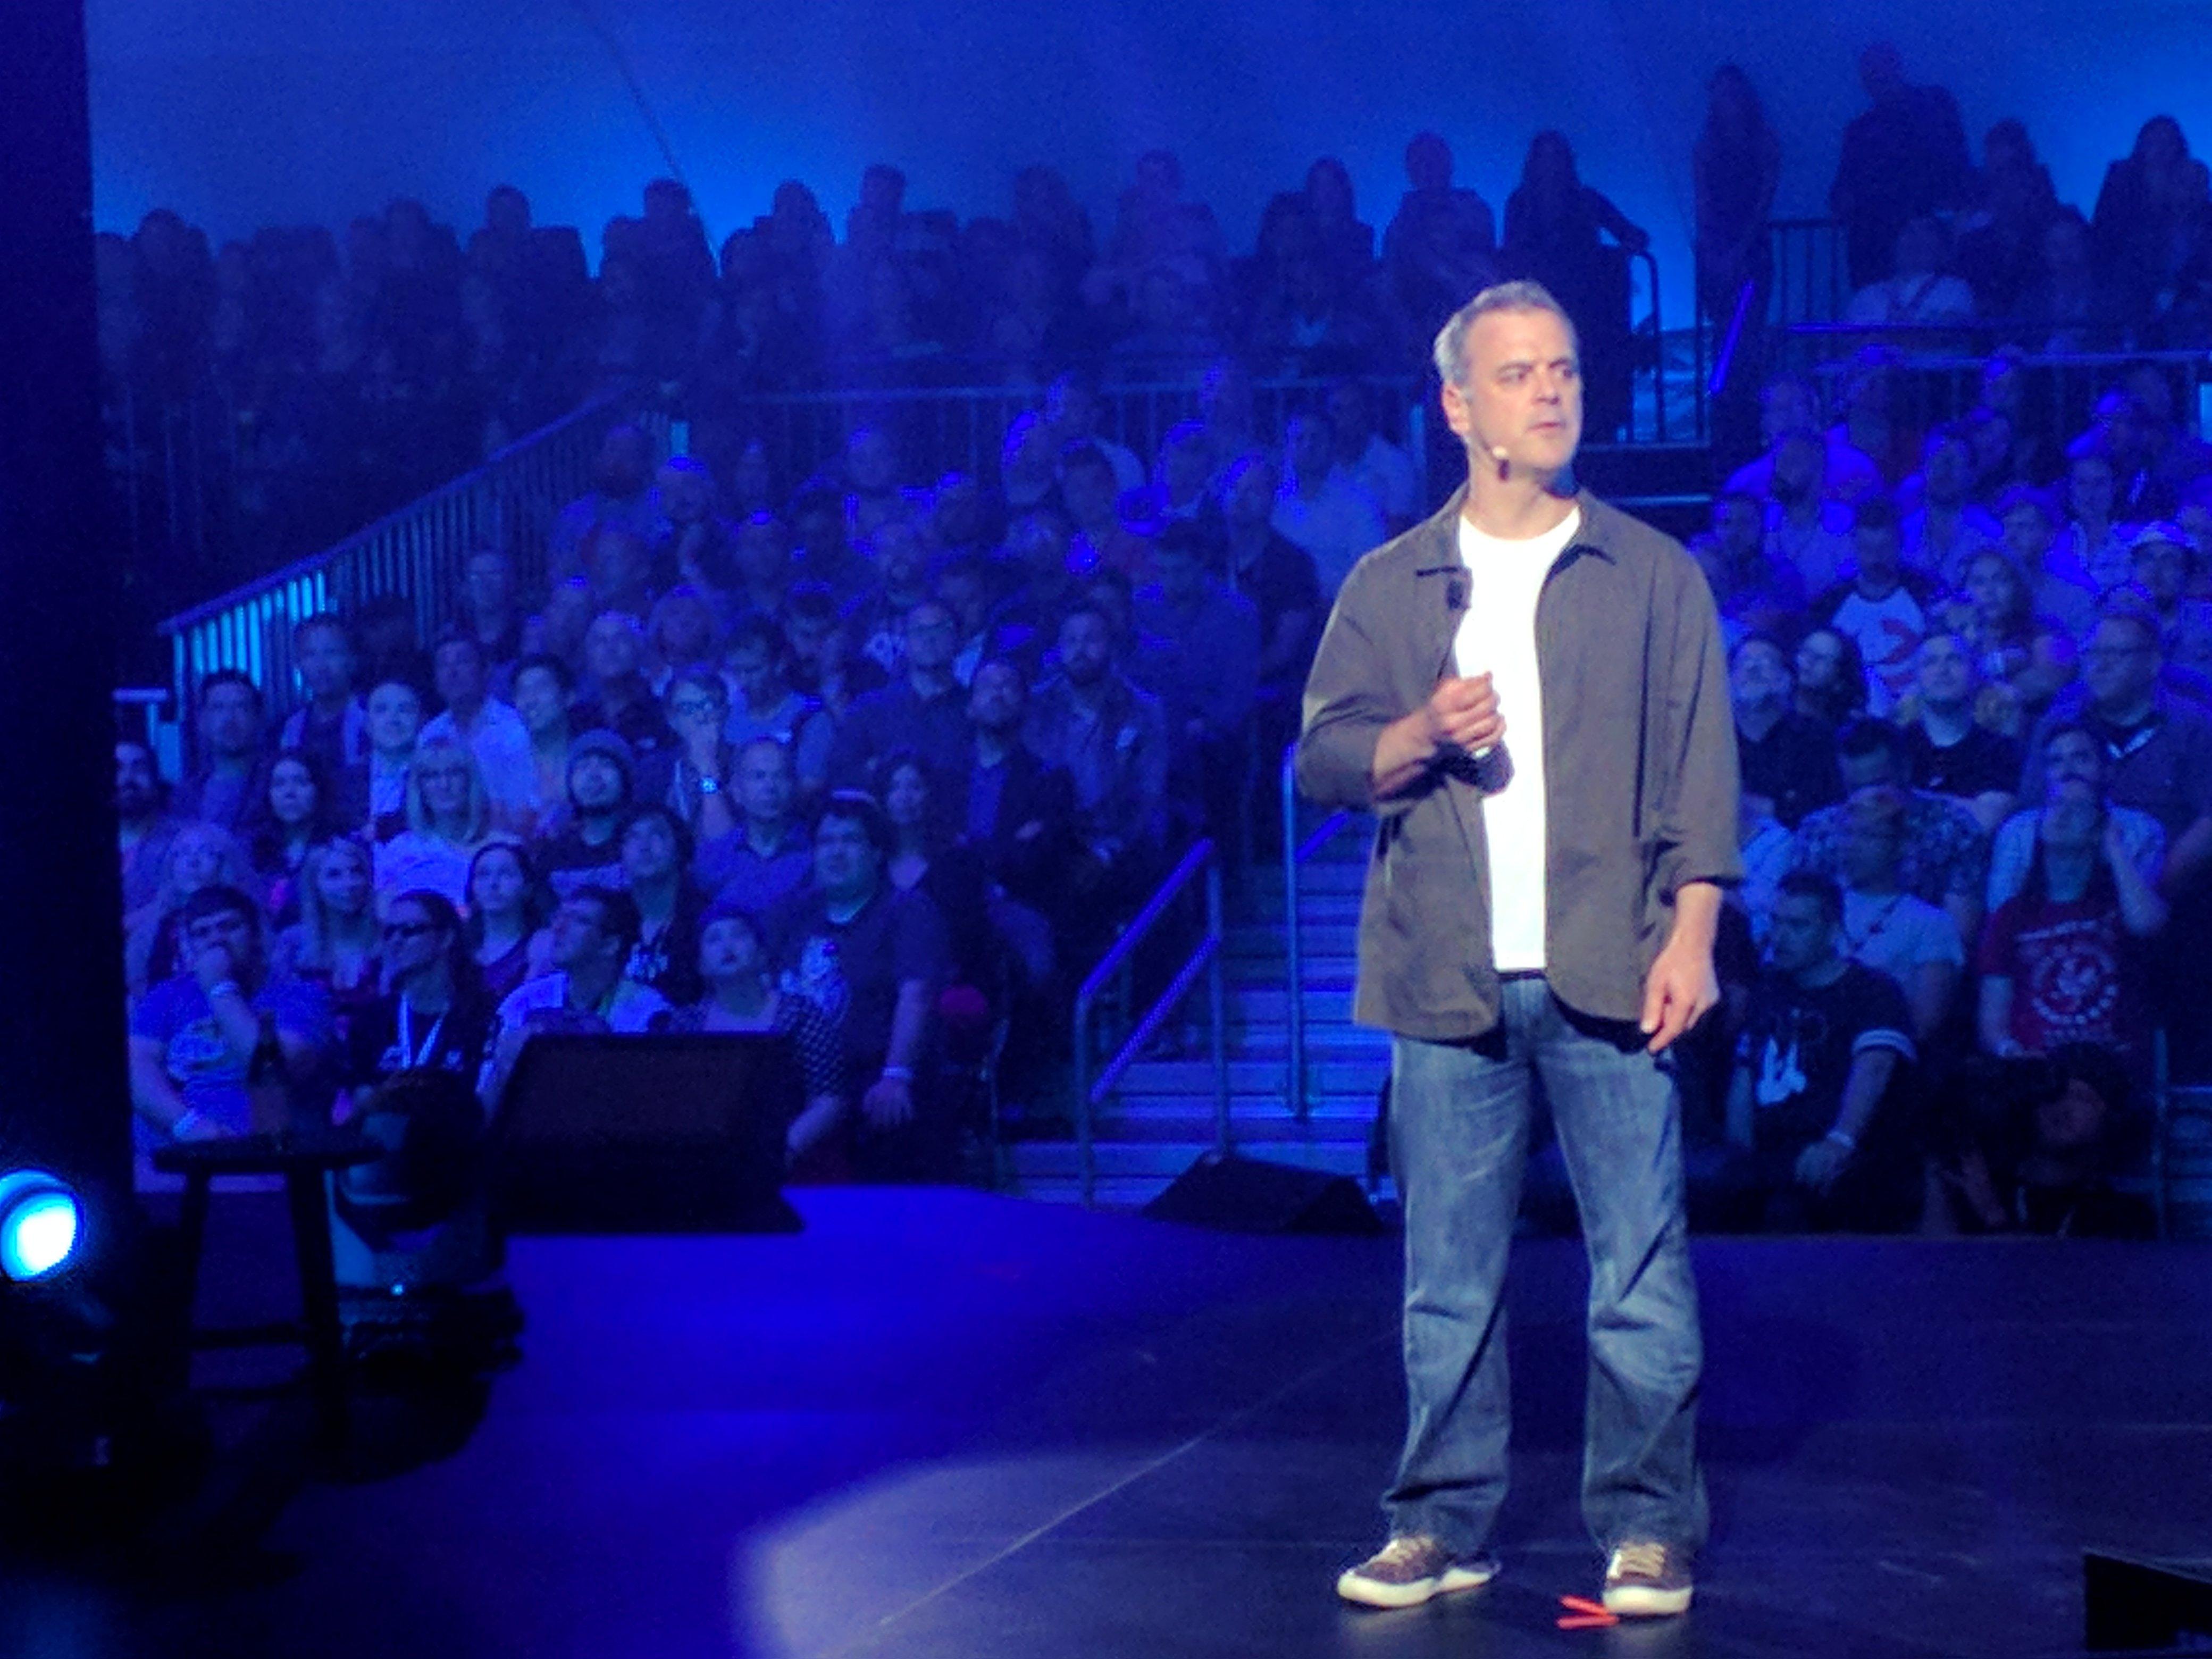 Pete Hines emceeing Bethesda's E3 showcase event.